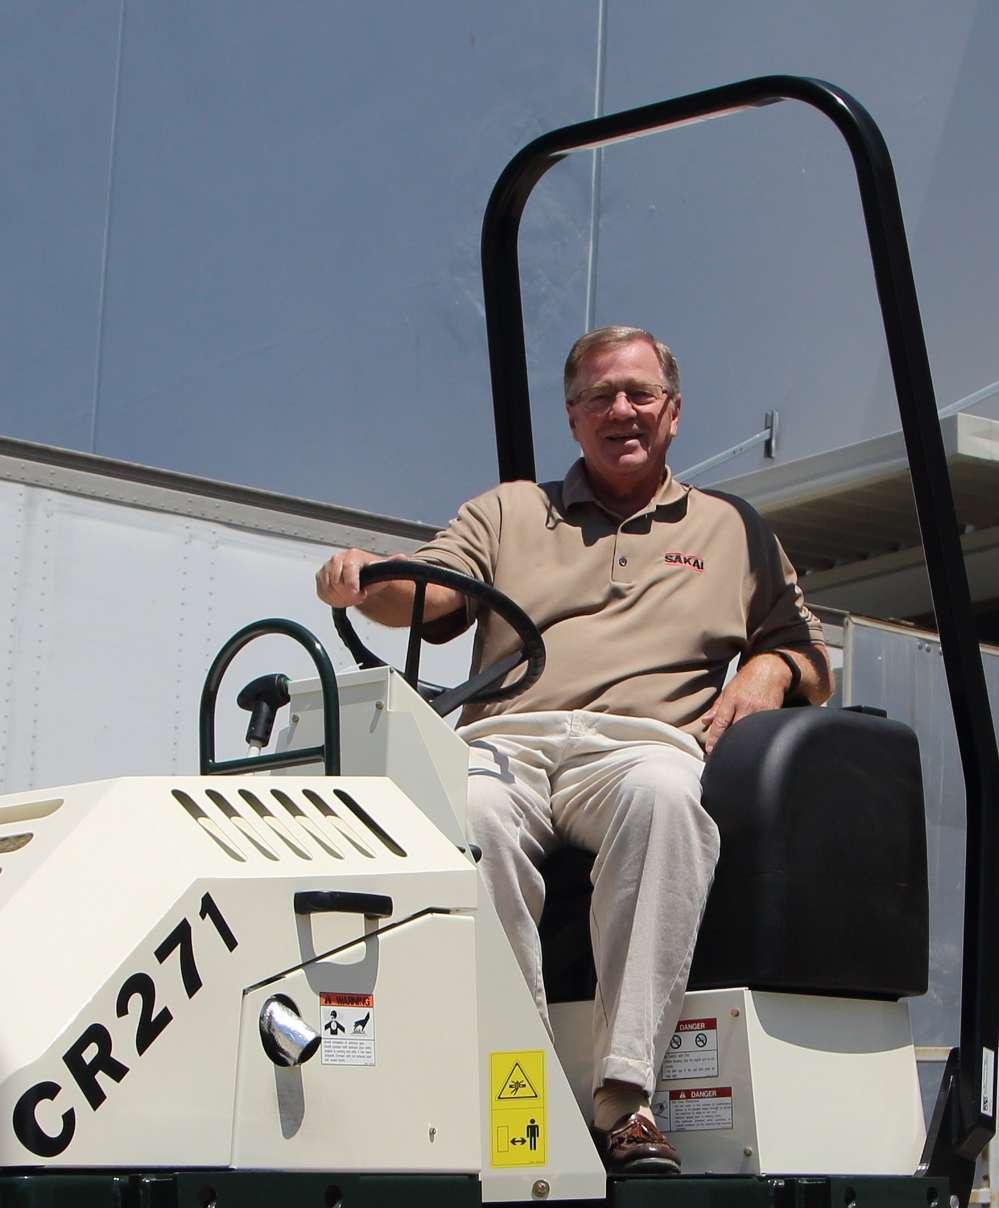 Dale Wilson, national light equipment sales manager, Sakai America Inc